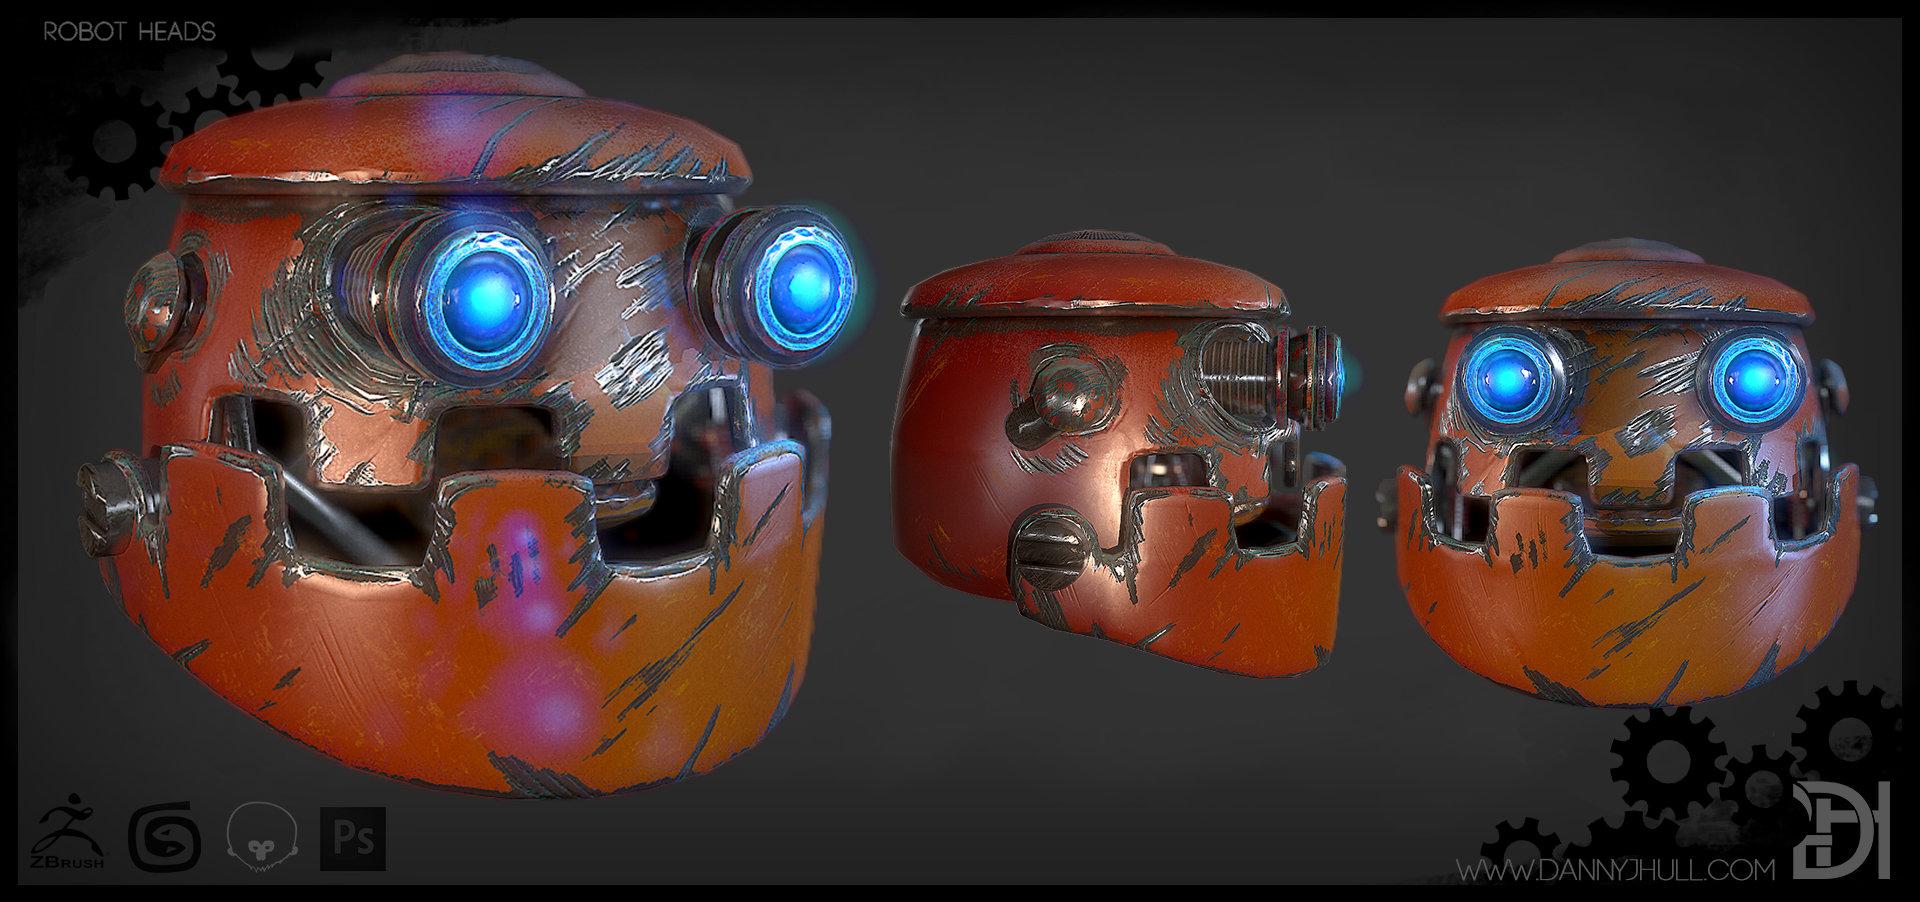 Daniel hull robot heads individual